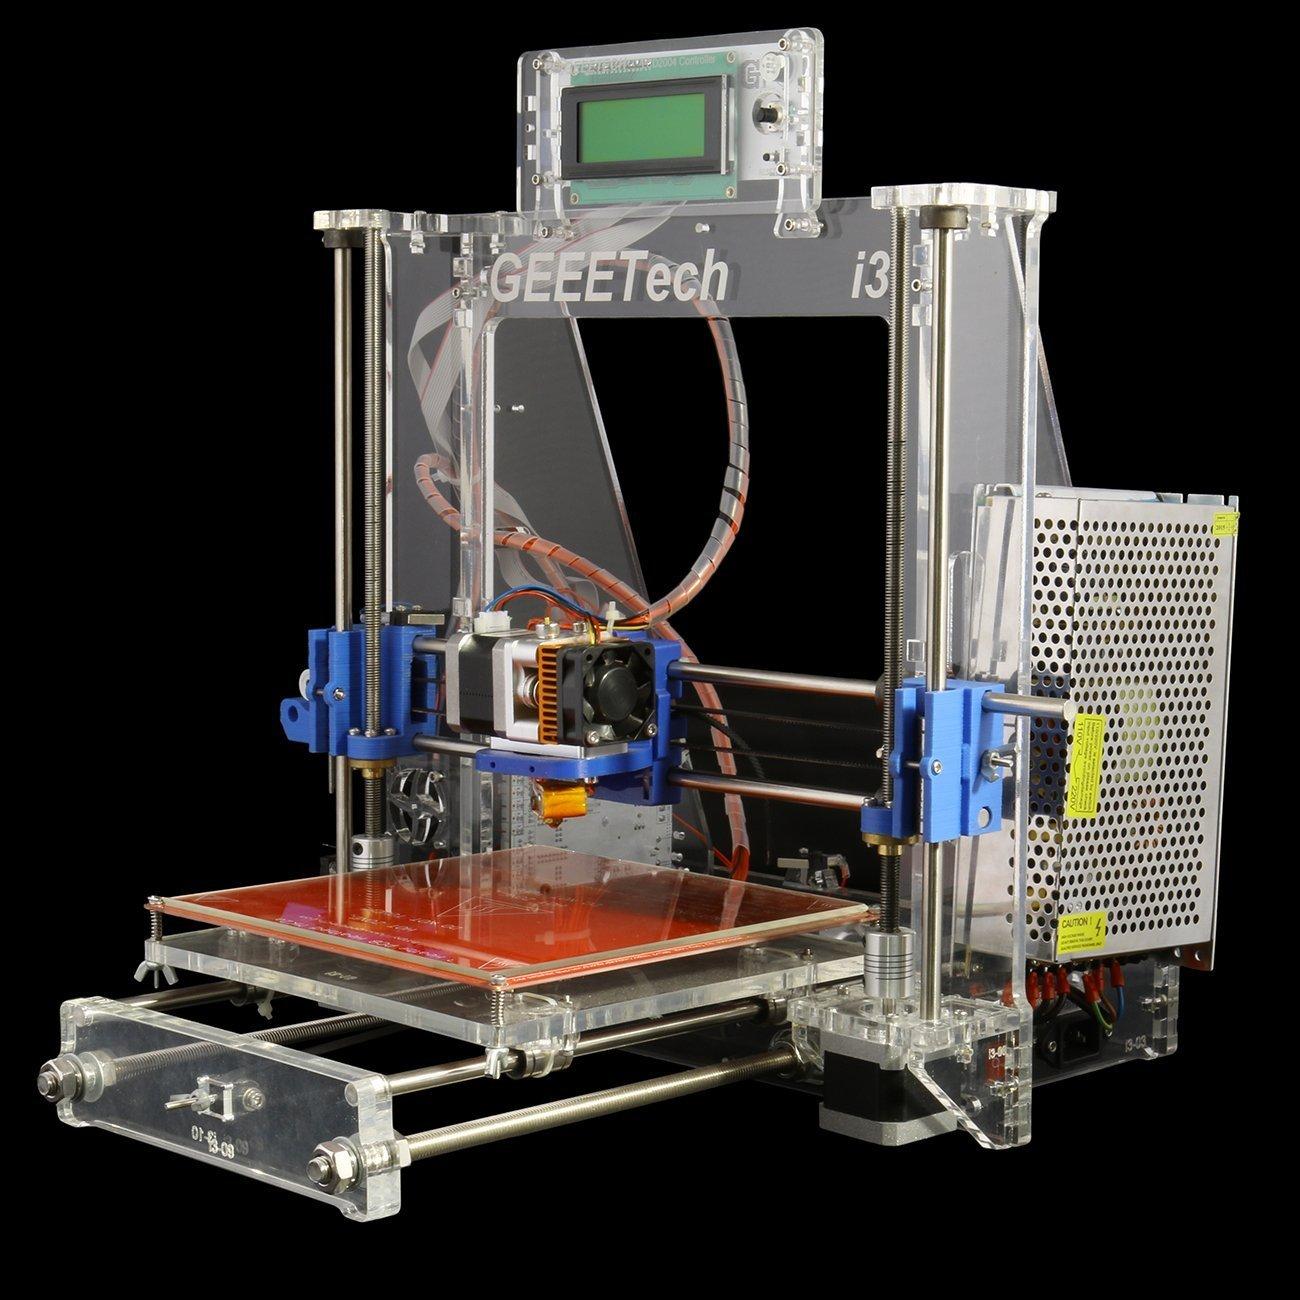 A desktop 3D printer with a transparent aluminum frame